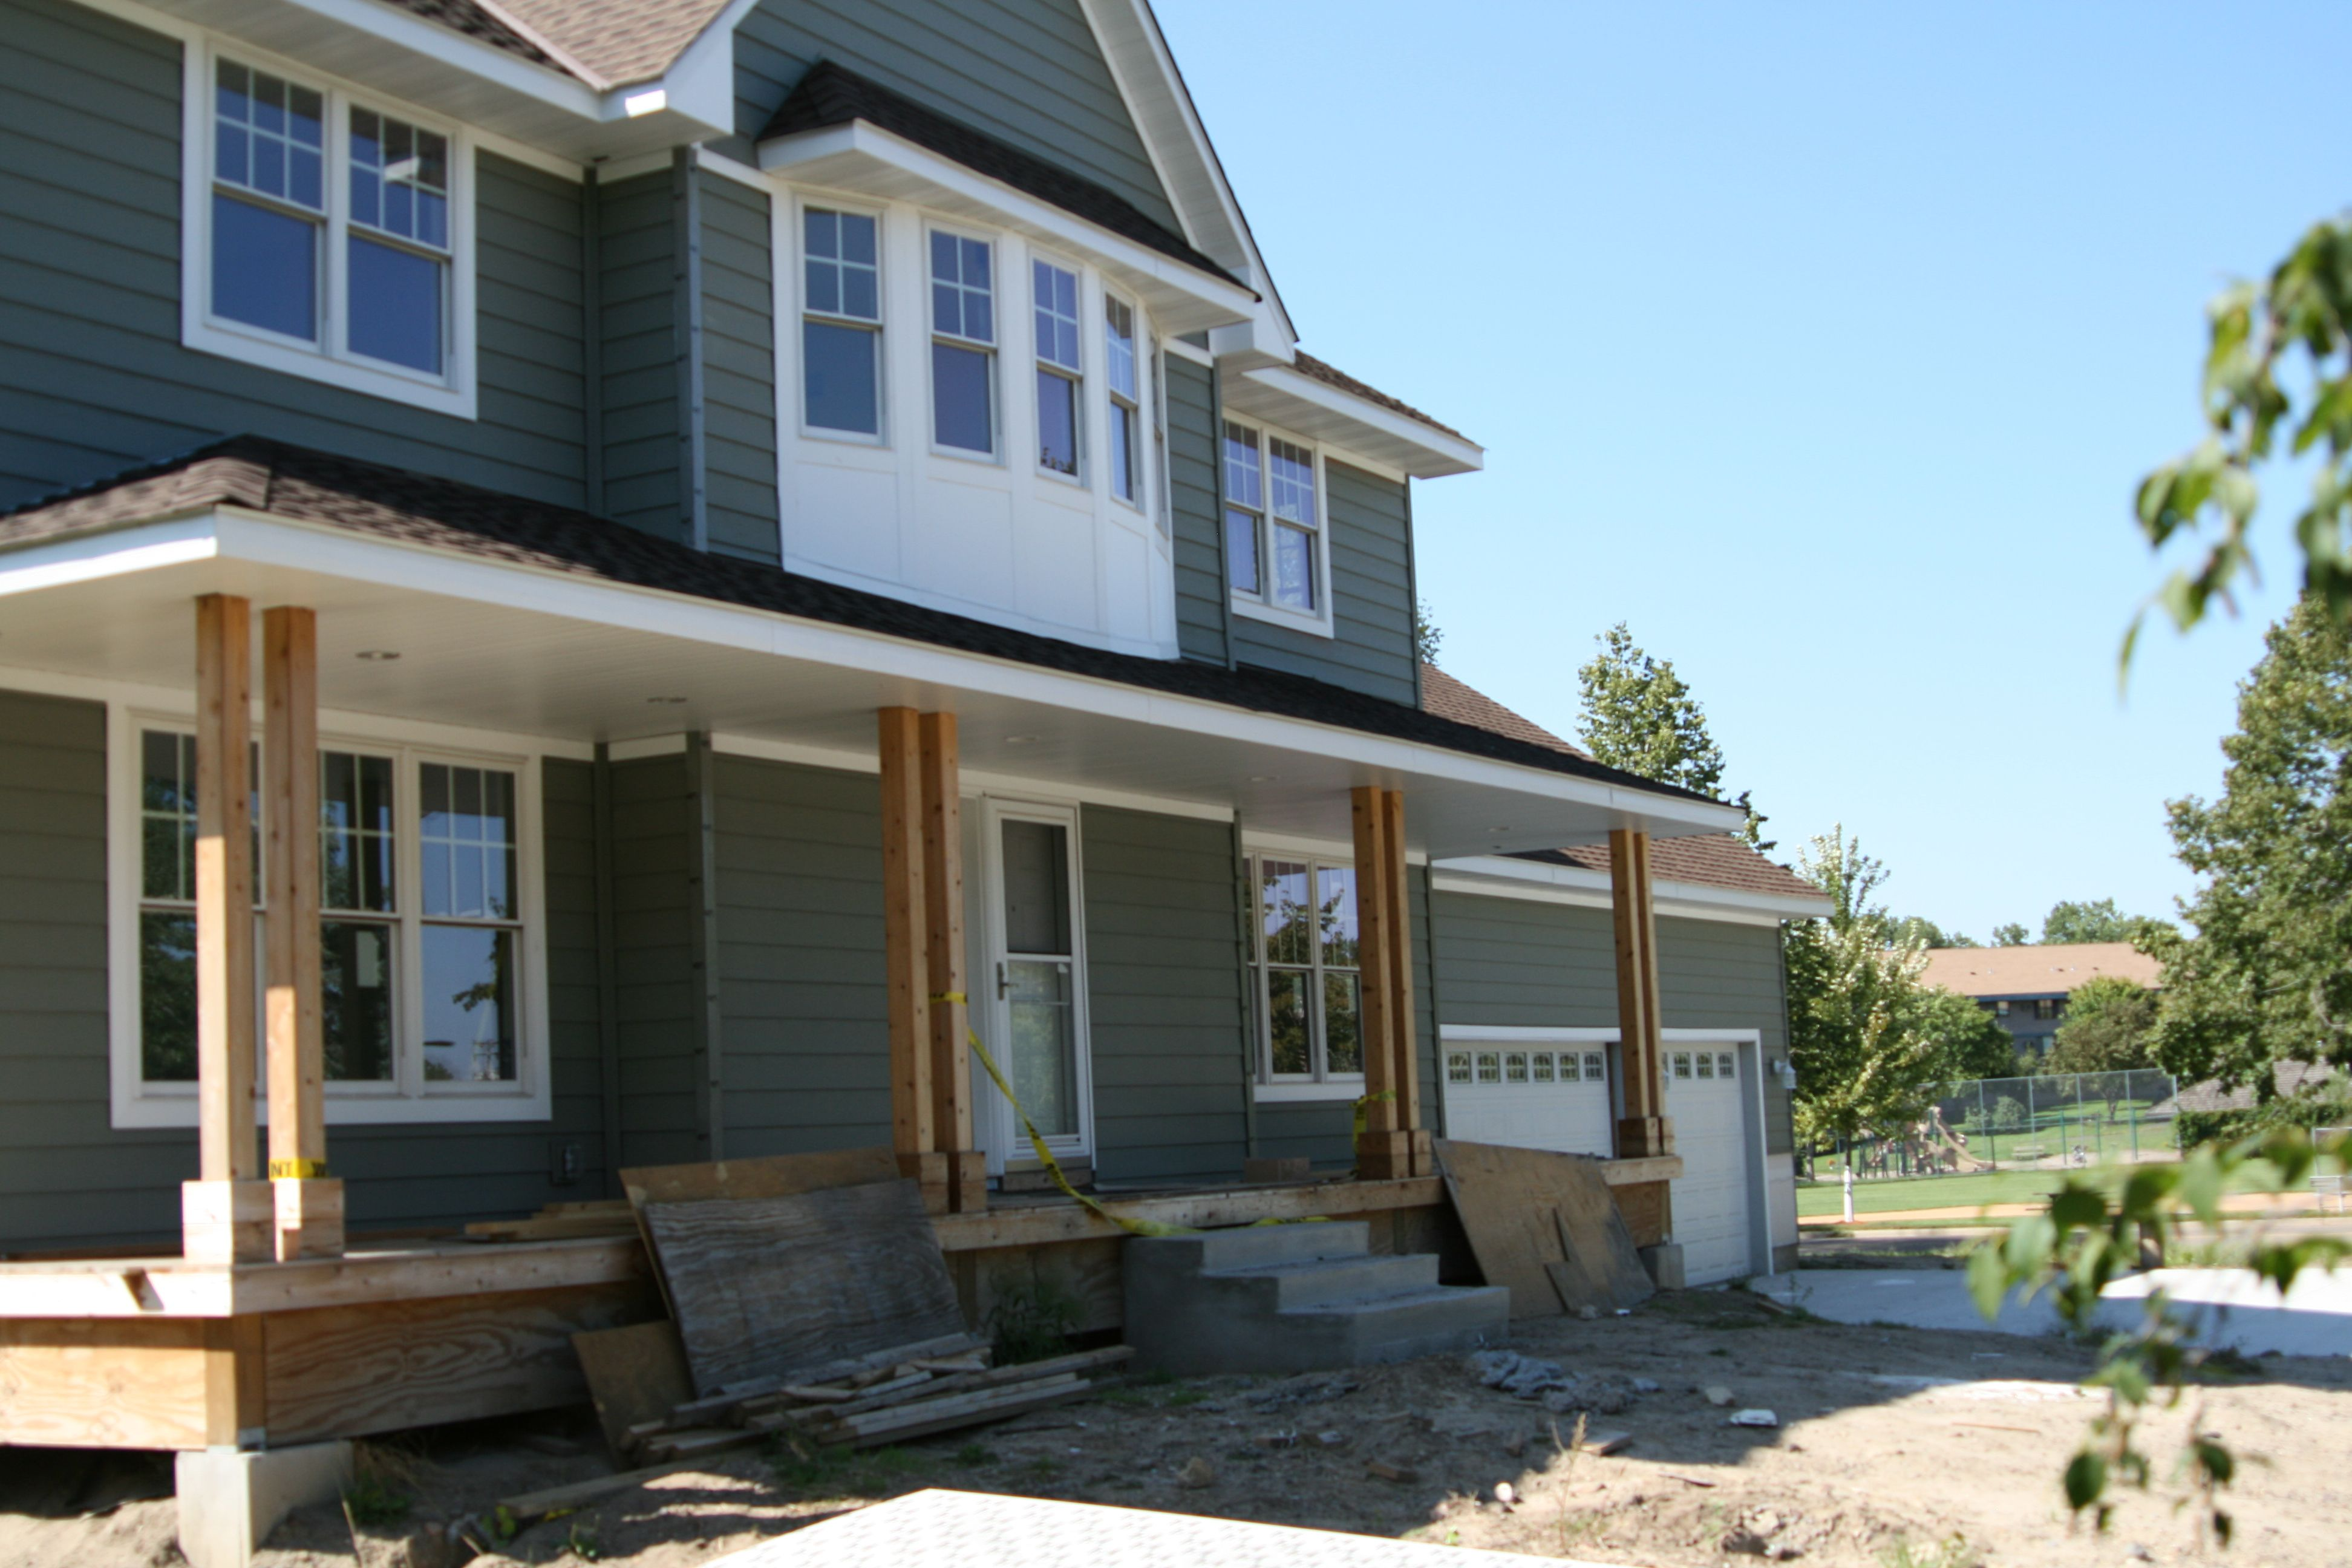 Home House Siding House Exterior Cladding